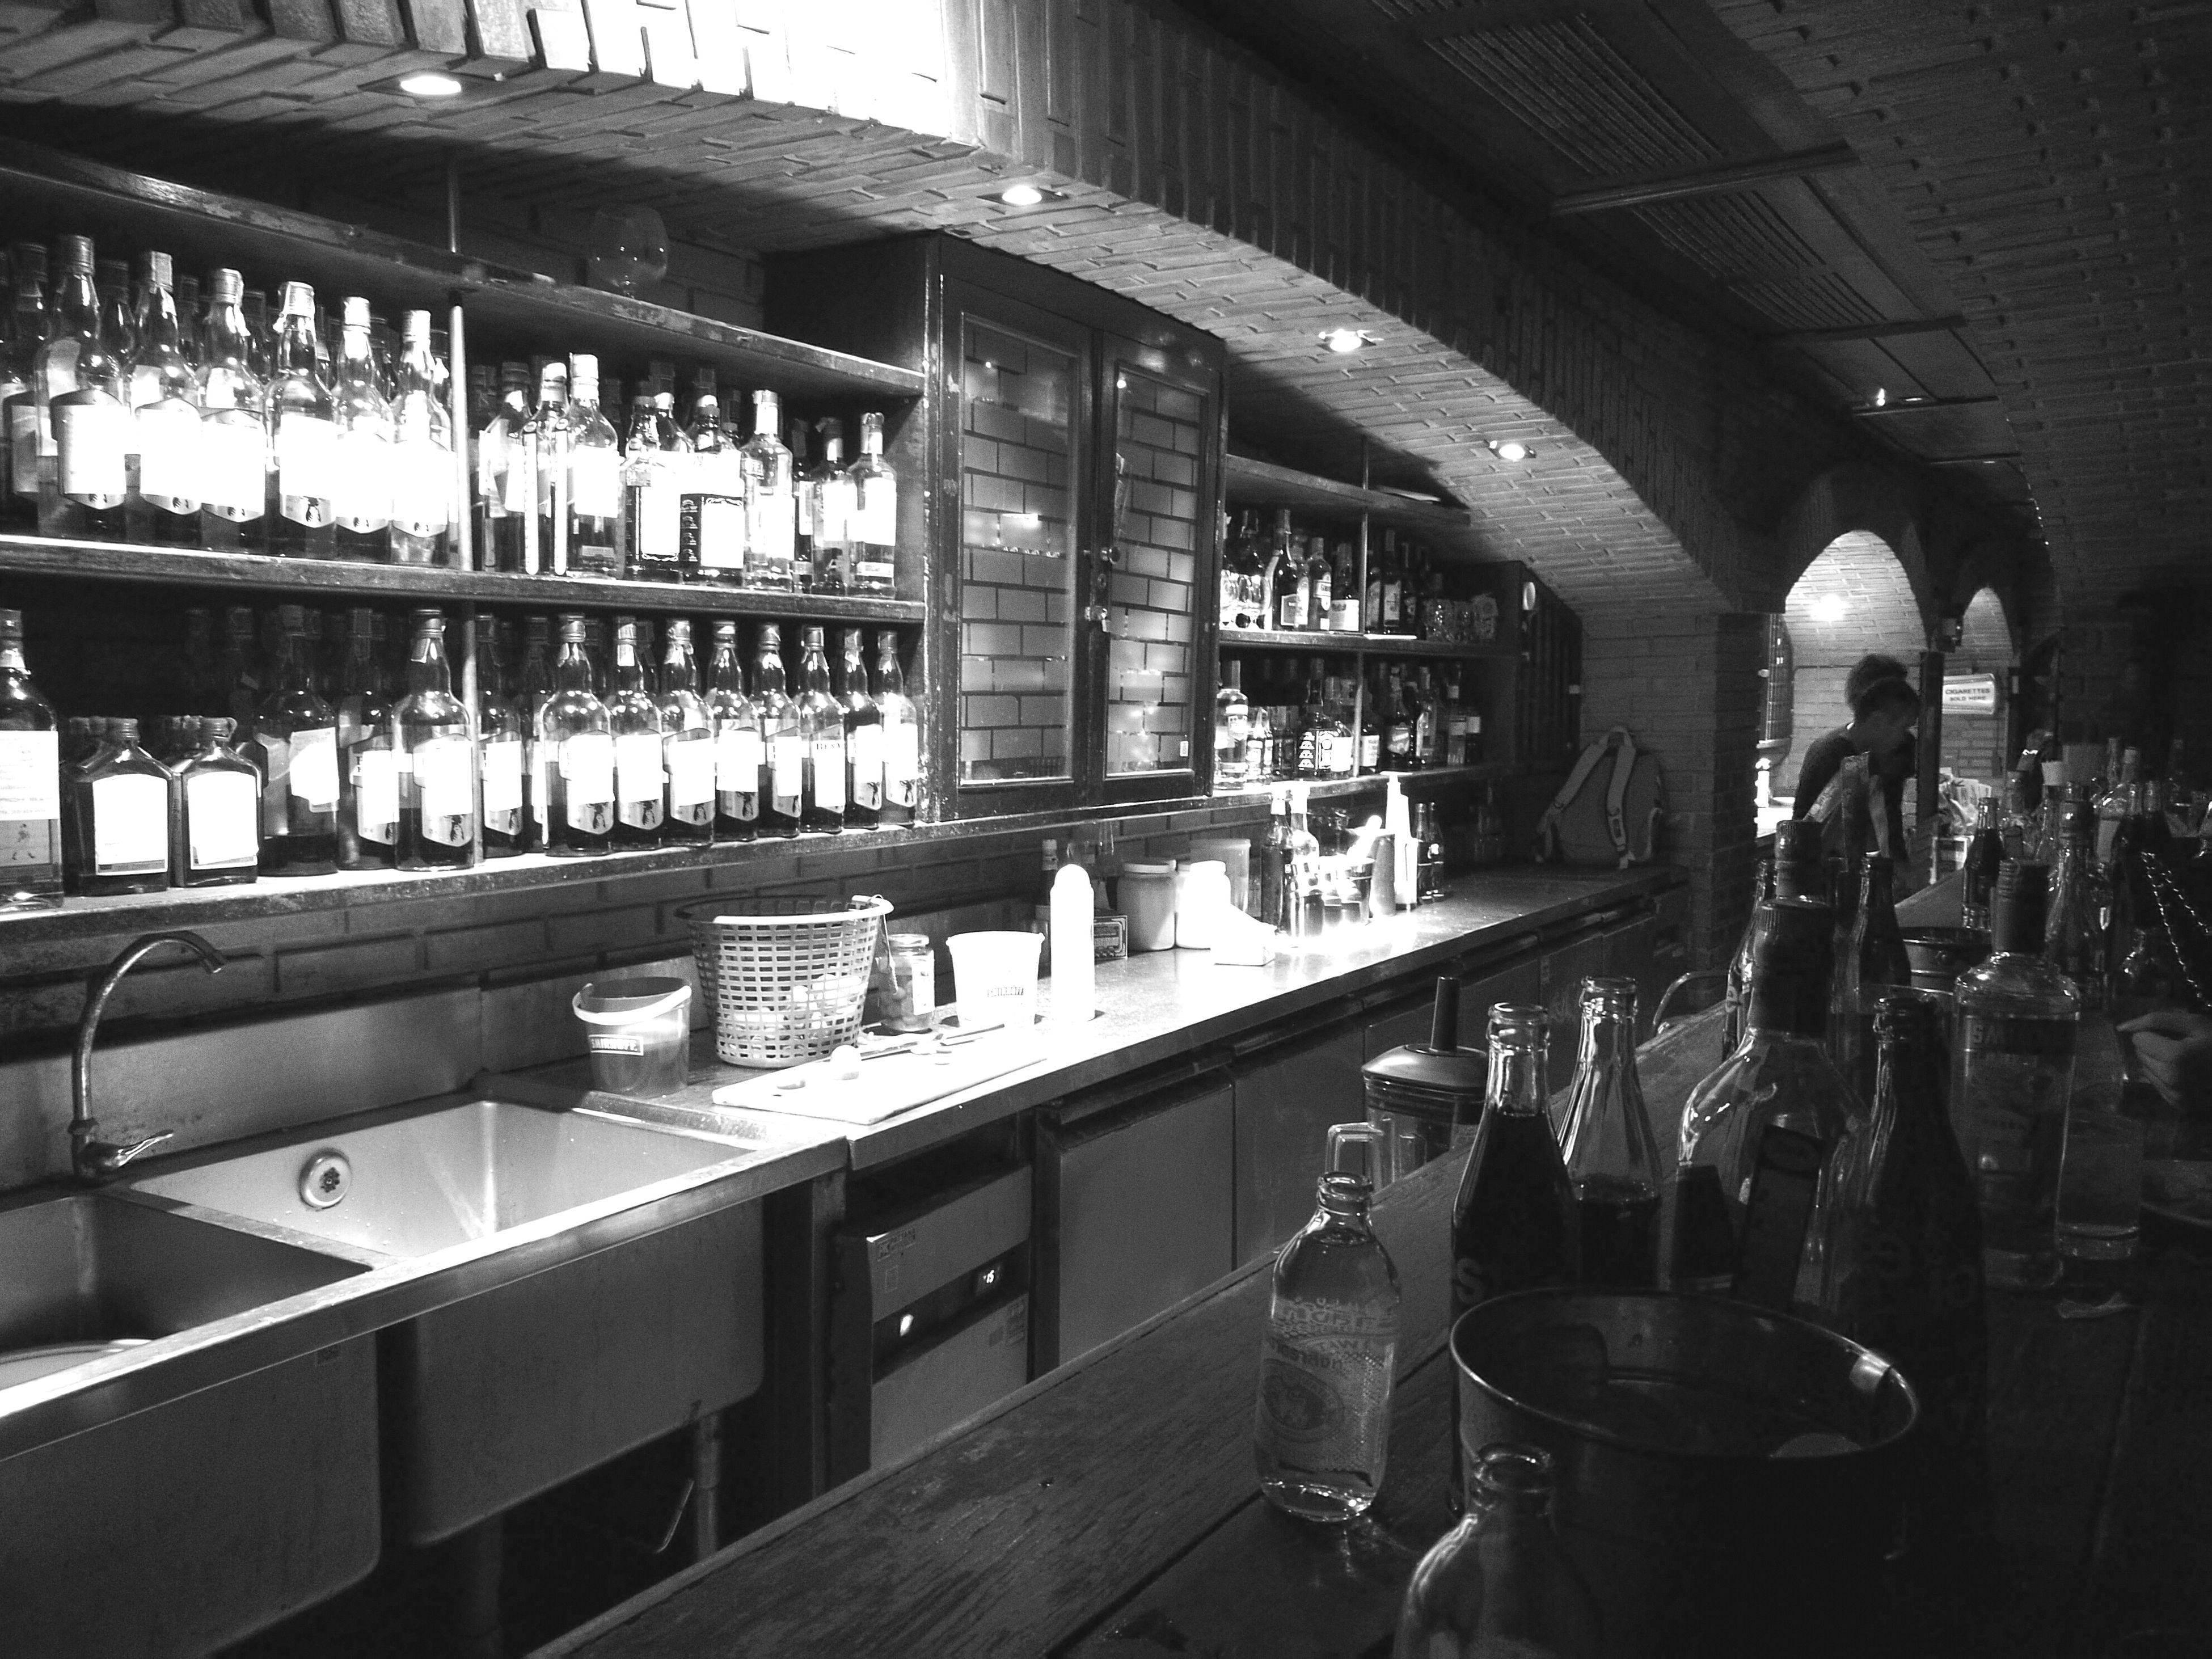 Super very HAPPY Bar Counter Drink Alcohol Thailandtravel Khaosarn Blackandwhite Brickbar Friends